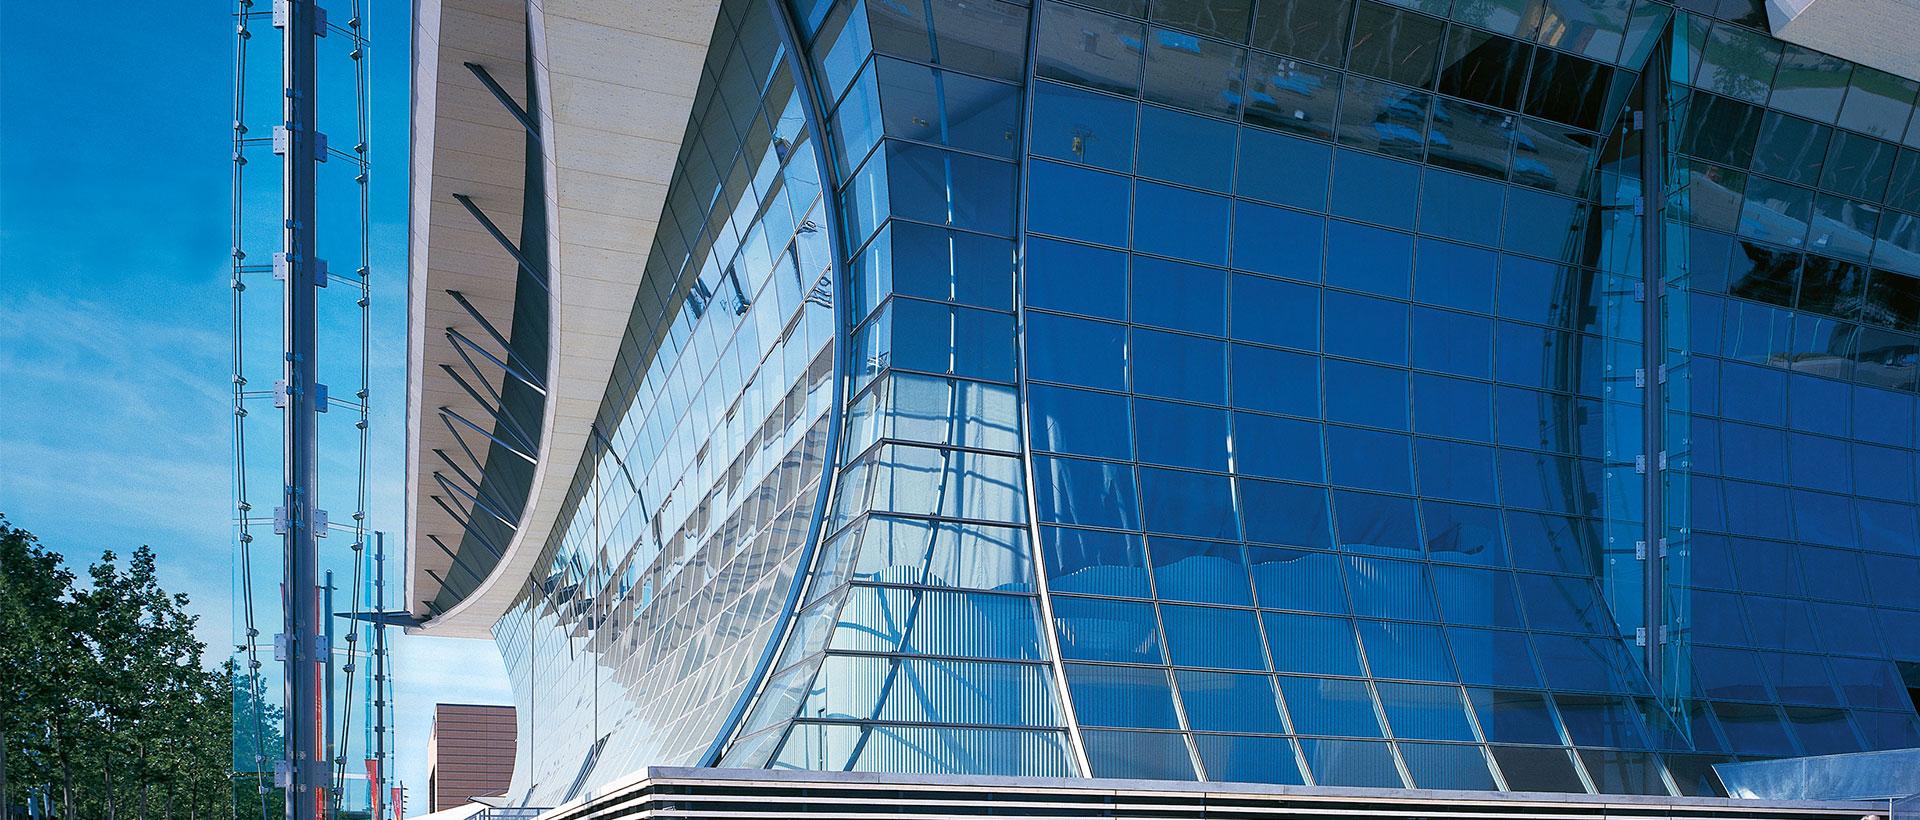 deltax-ingenieurbuero-stuttgart-bauten-konstruieren-deutscher-pavillon